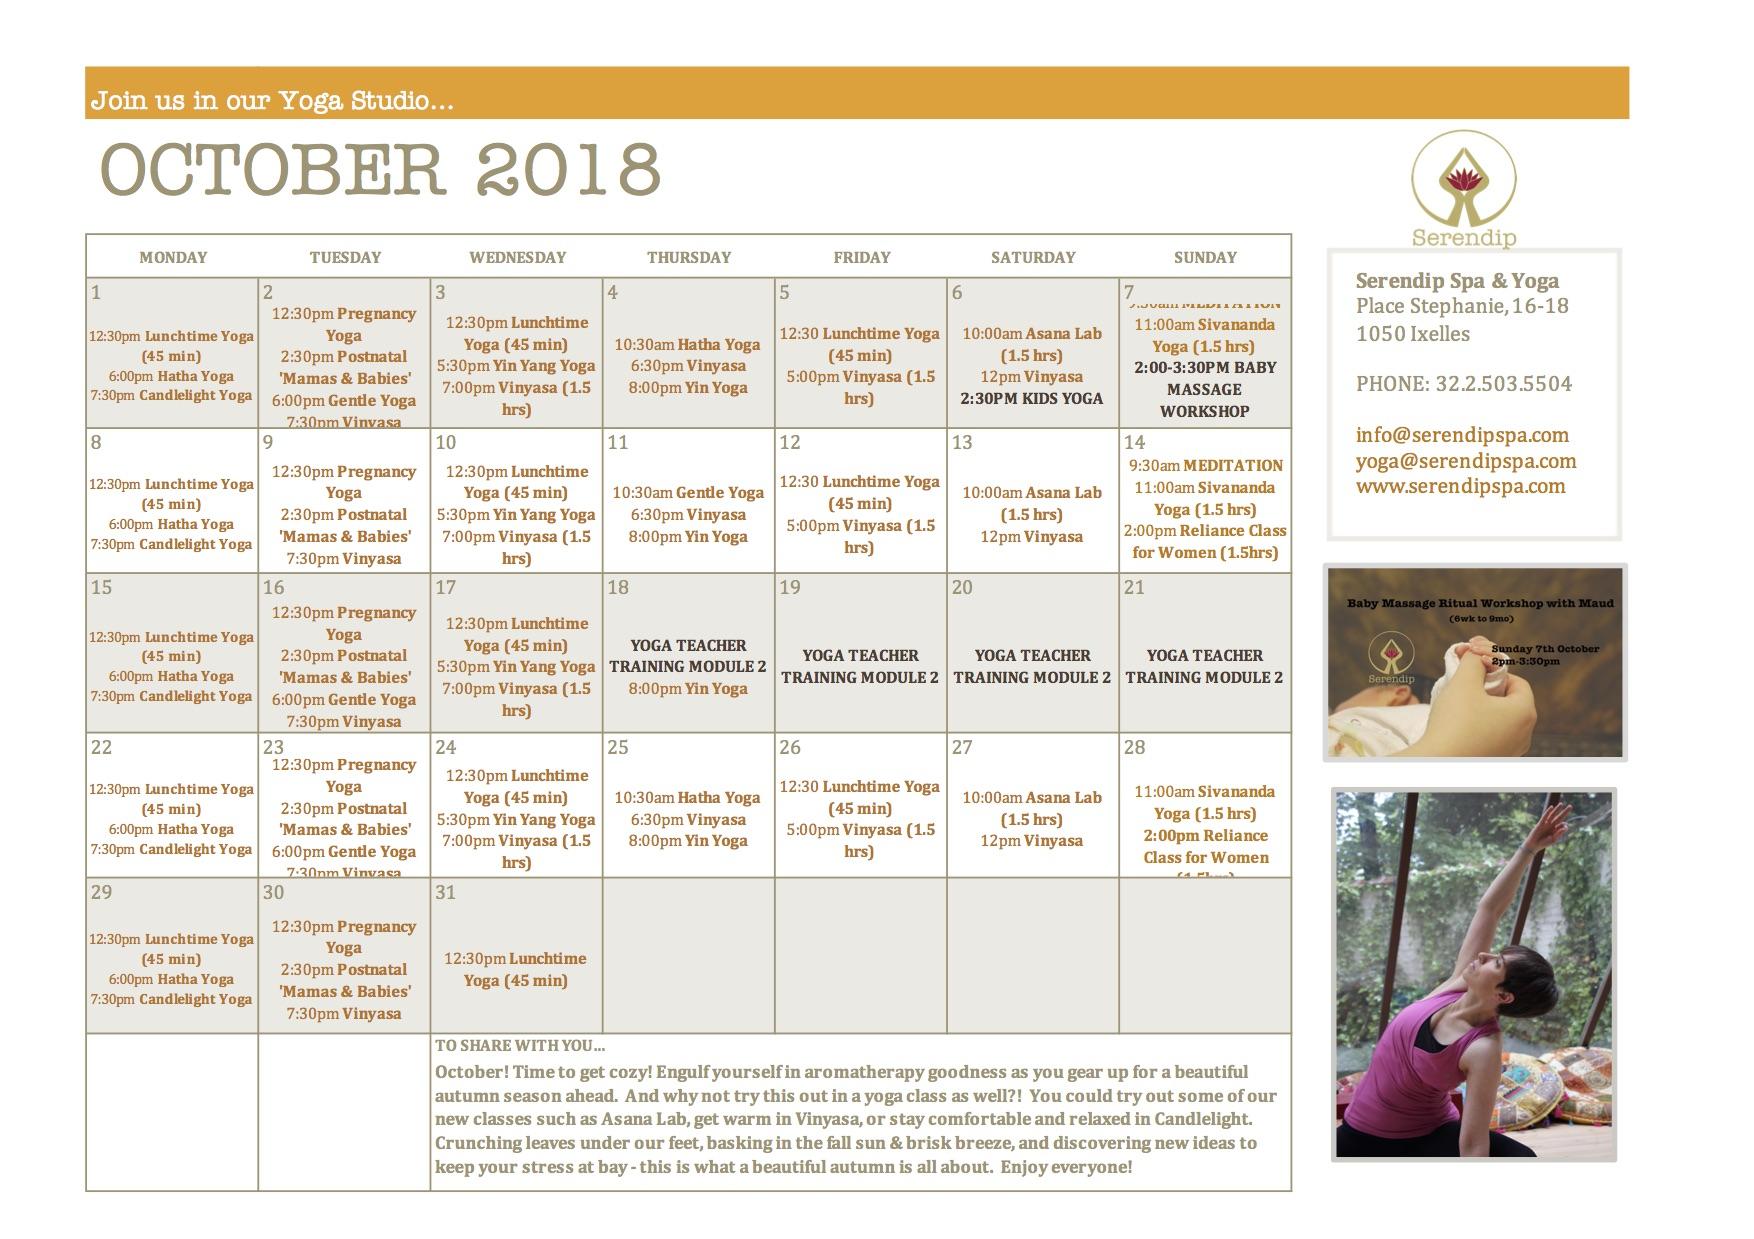 serendip spa and yoga calendar 2018_October A4 FRONT.jpg